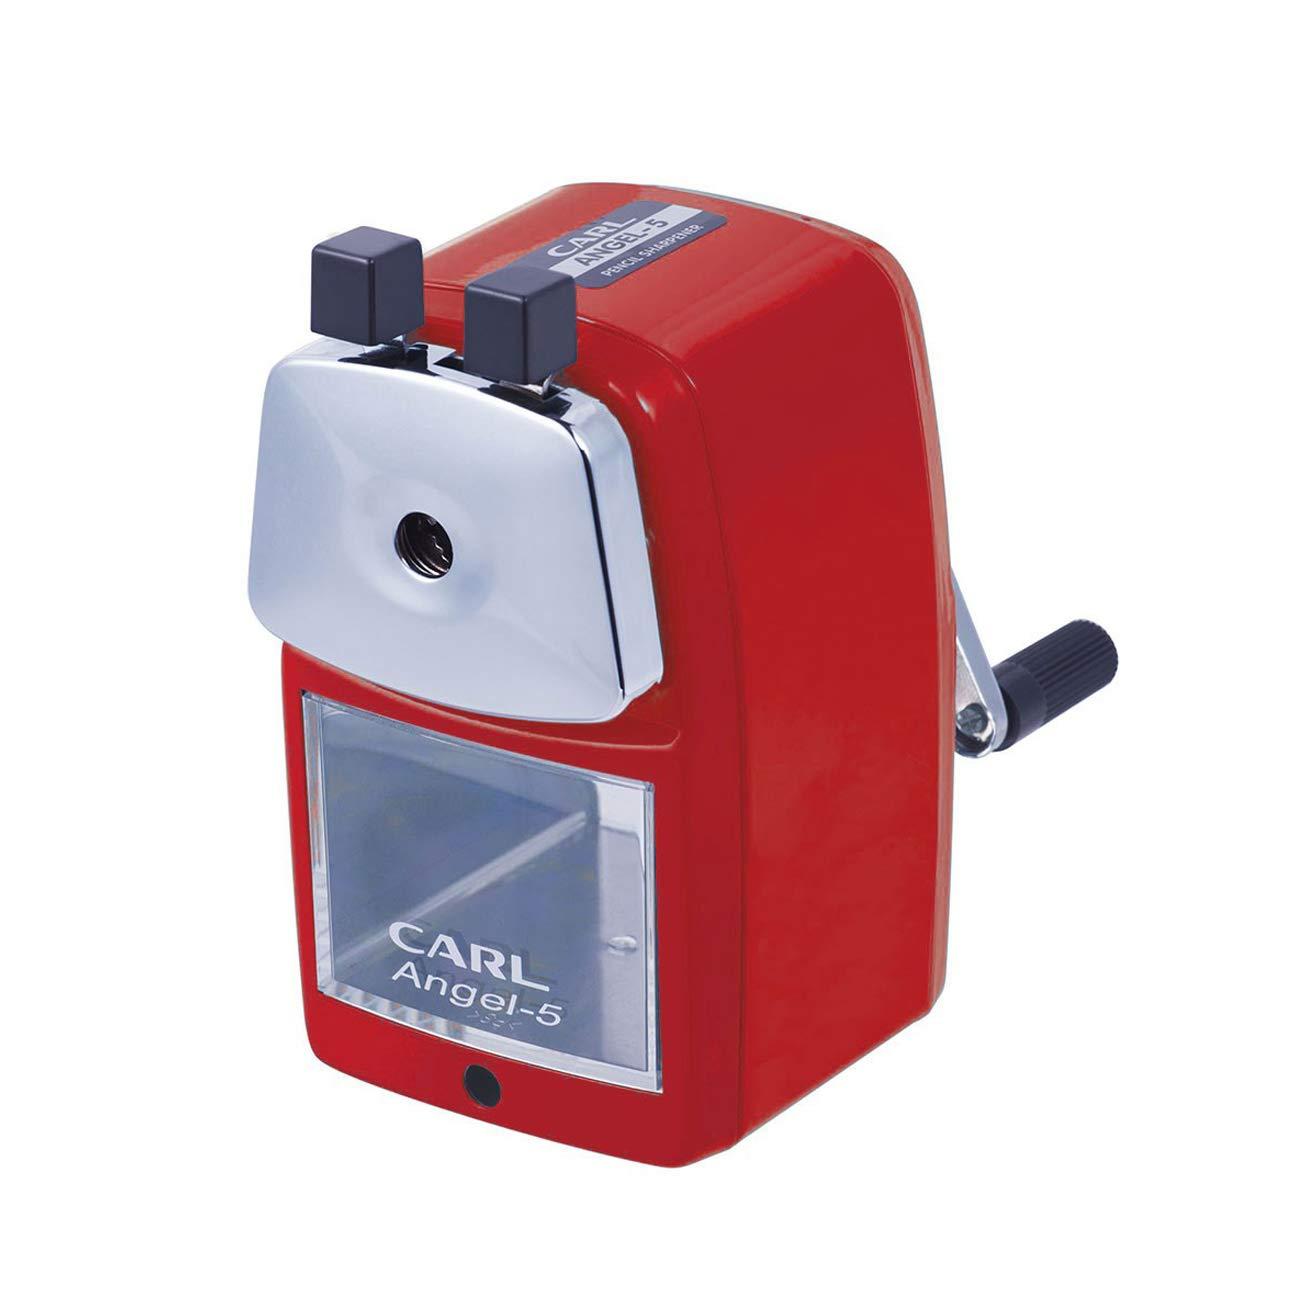 CARL Angel-5 Pencil Sharpener, Red CARL / Pencils Etc. Carl A-5 Angel 5